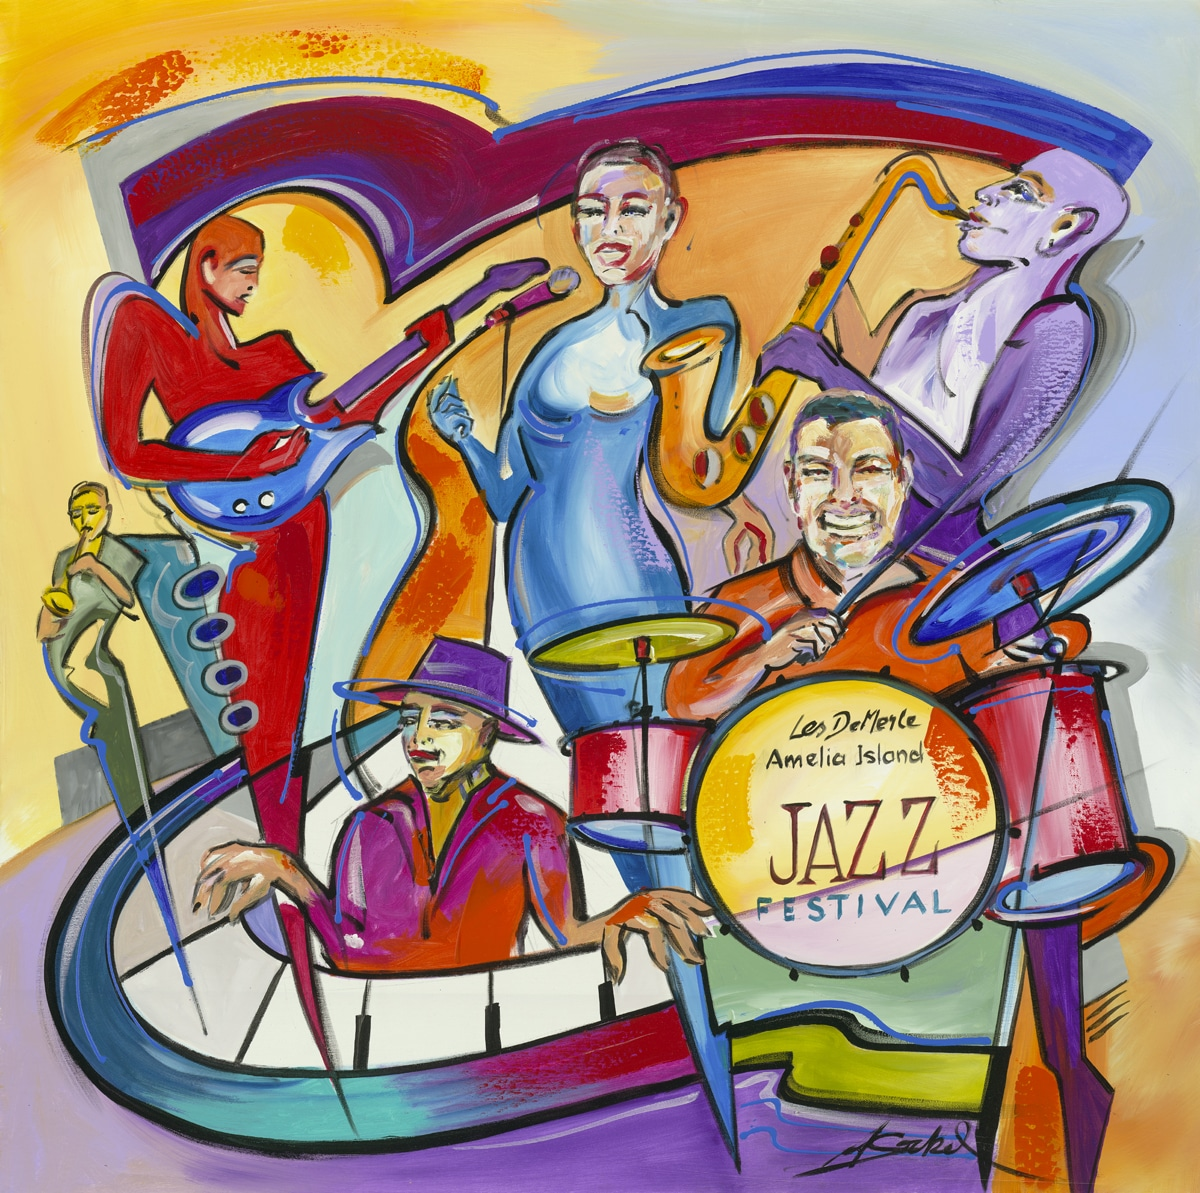 Amelia Island Jazz Festival Alfred Gockel